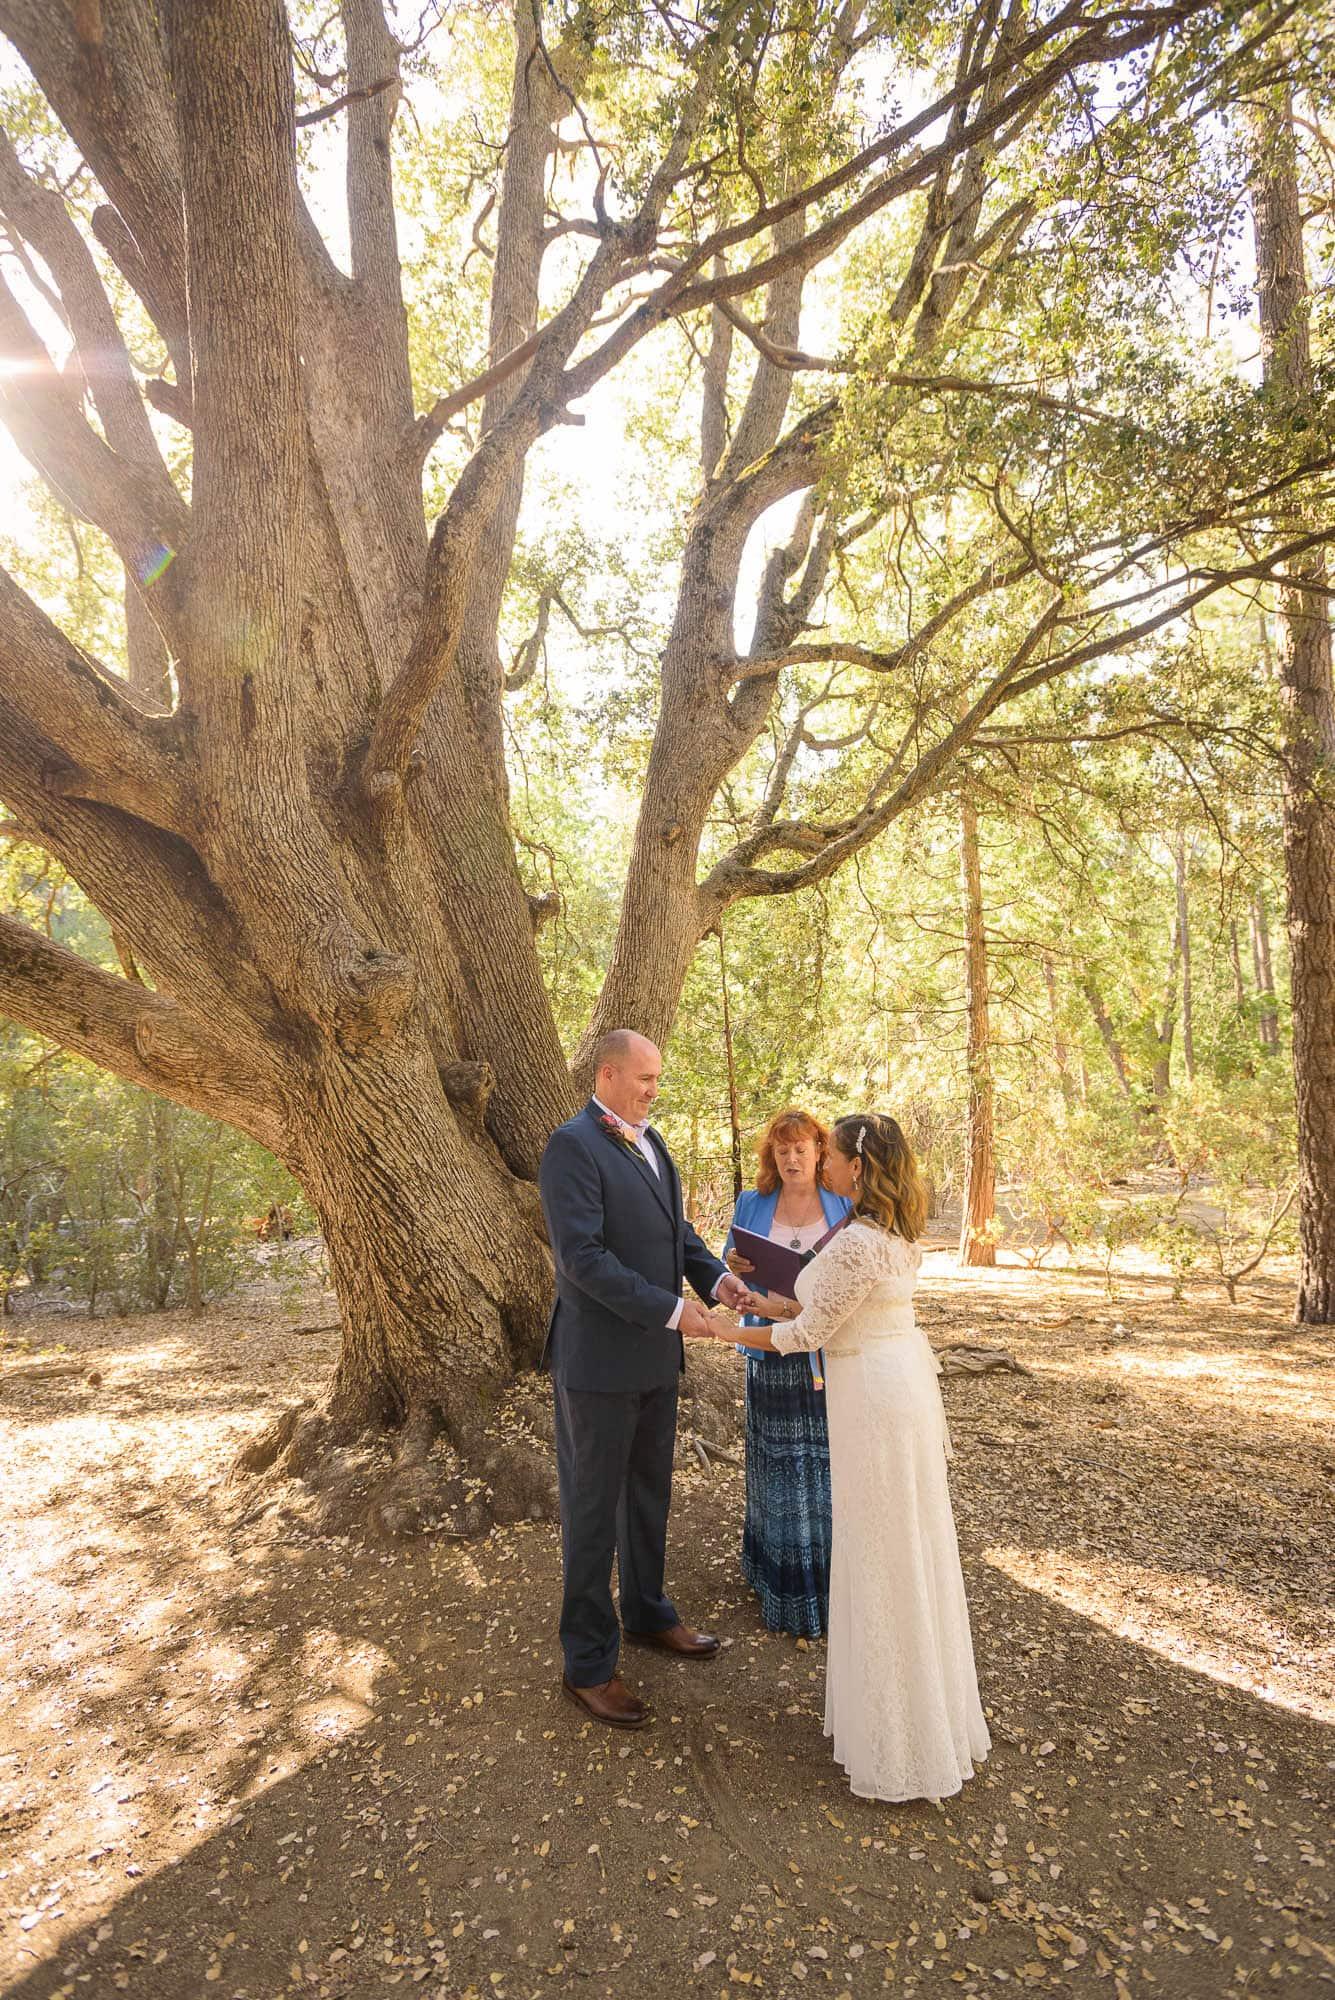 013_Alan_and_Heidi_Wedding_Jackie_Dannon